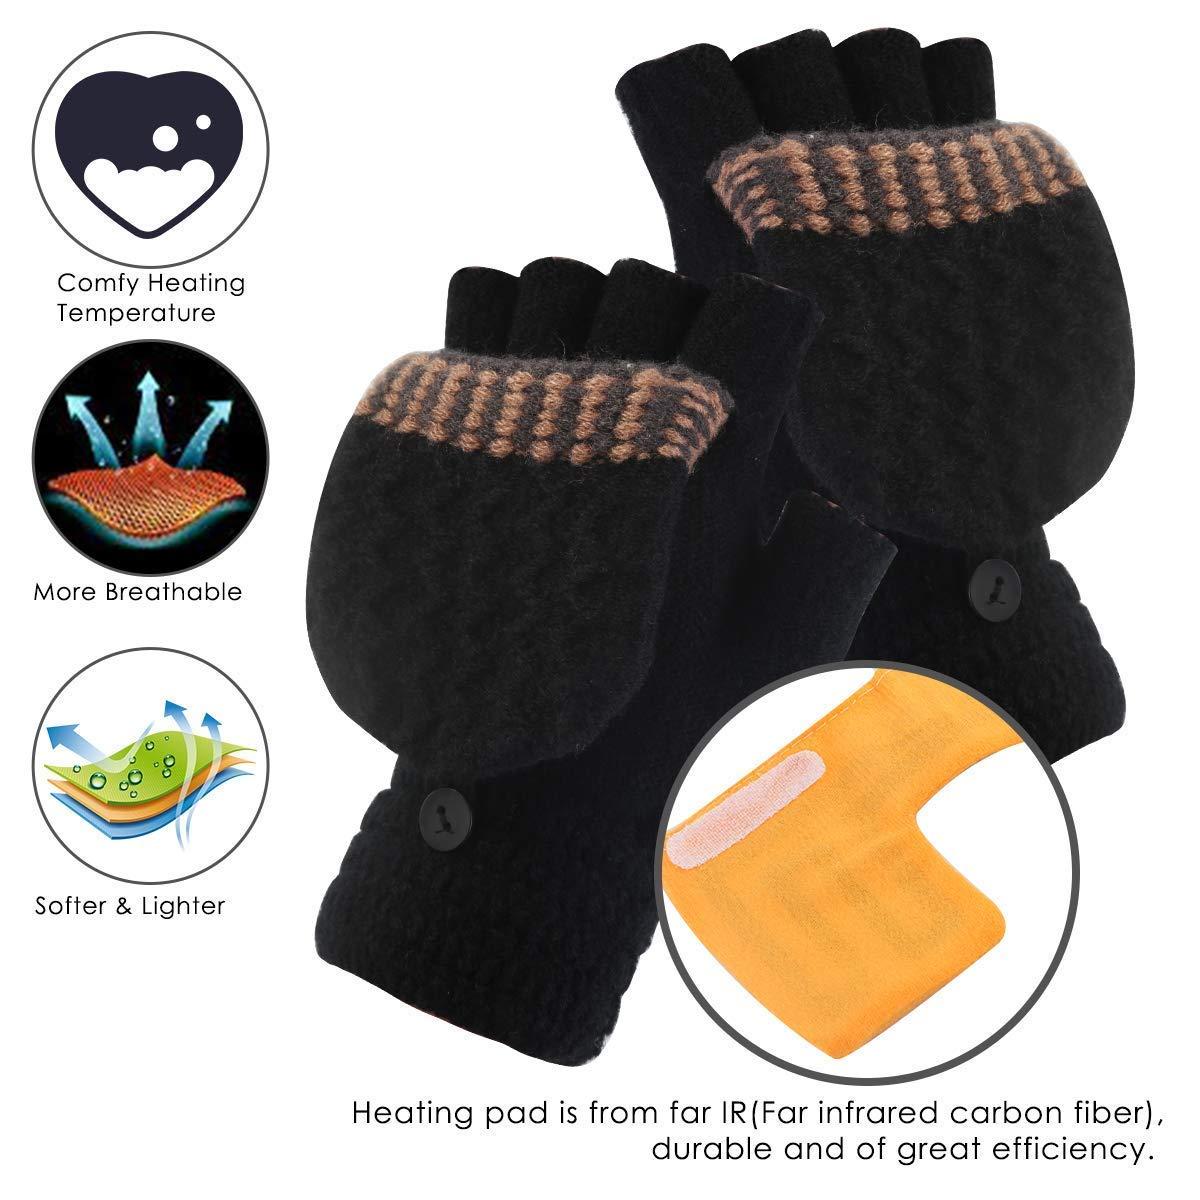 Best Winter Gift Choice Unisex USB Heated Gloves Mitten Winter Warm Hands Knitting Heated Laptop Gloves,Half/&Full Finger Mittens for Women Men Girls Boys Large Size Grey